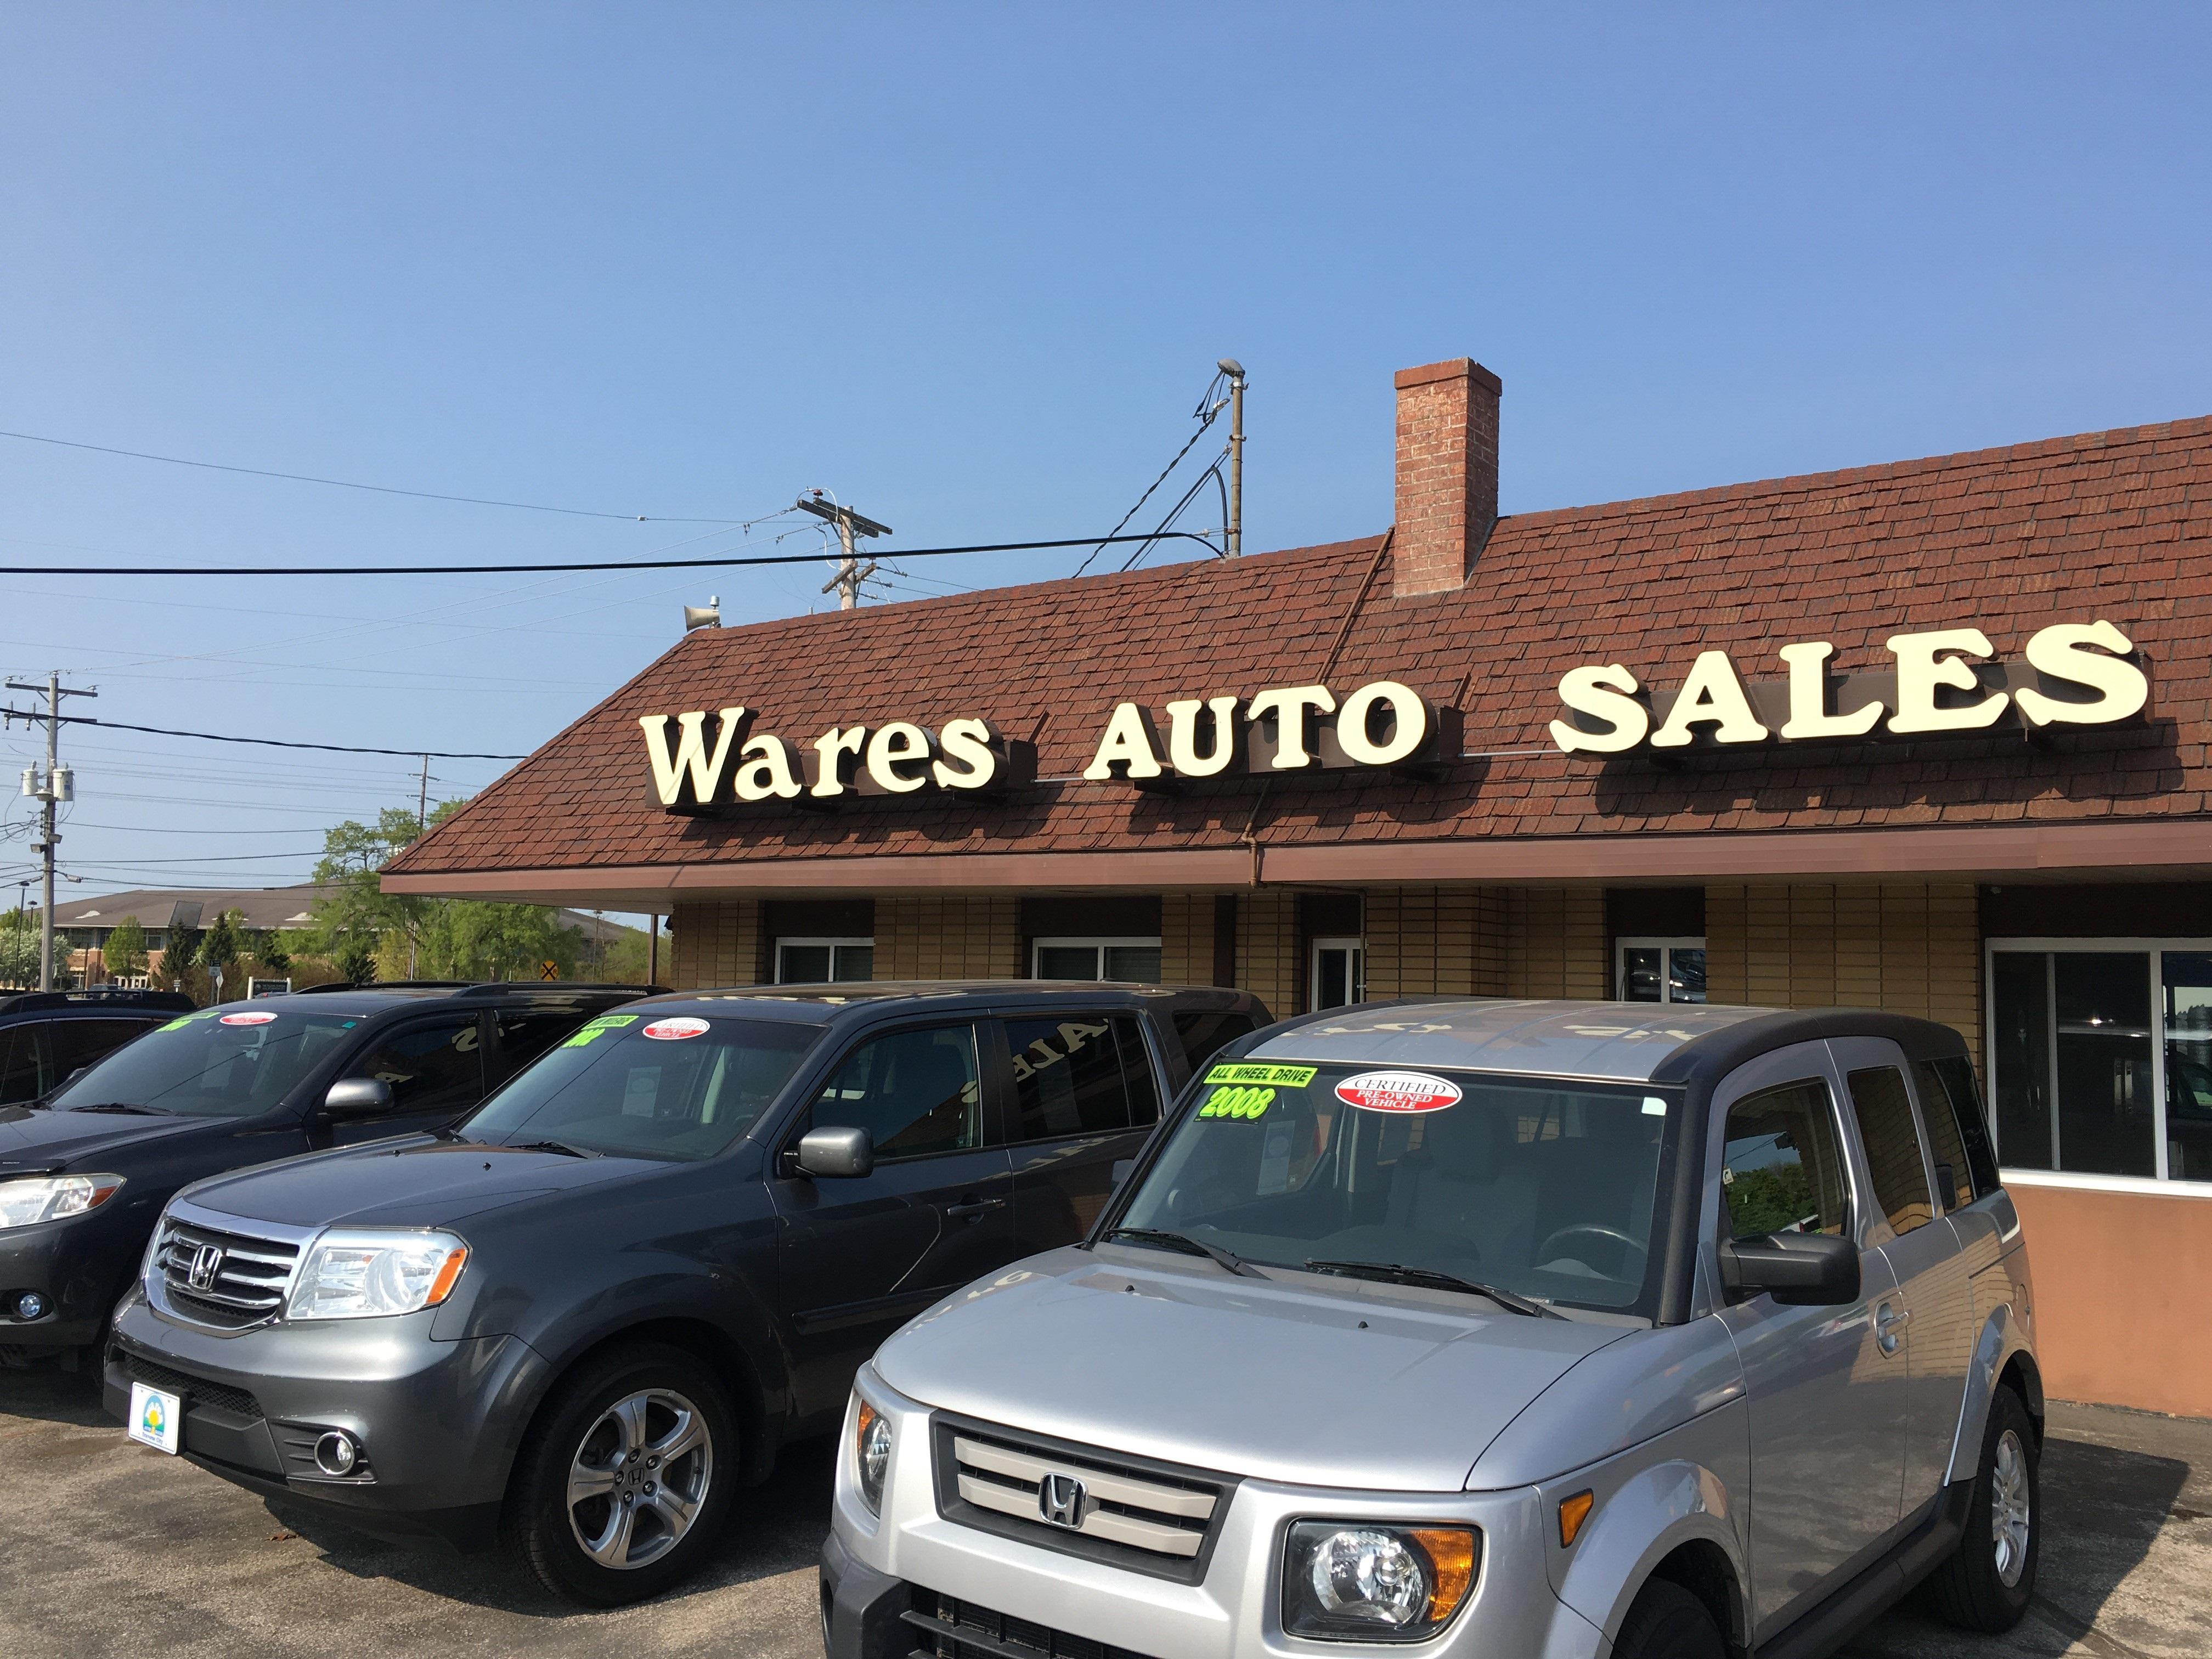 wares auto sales in traverse city mi 49686. Black Bedroom Furniture Sets. Home Design Ideas